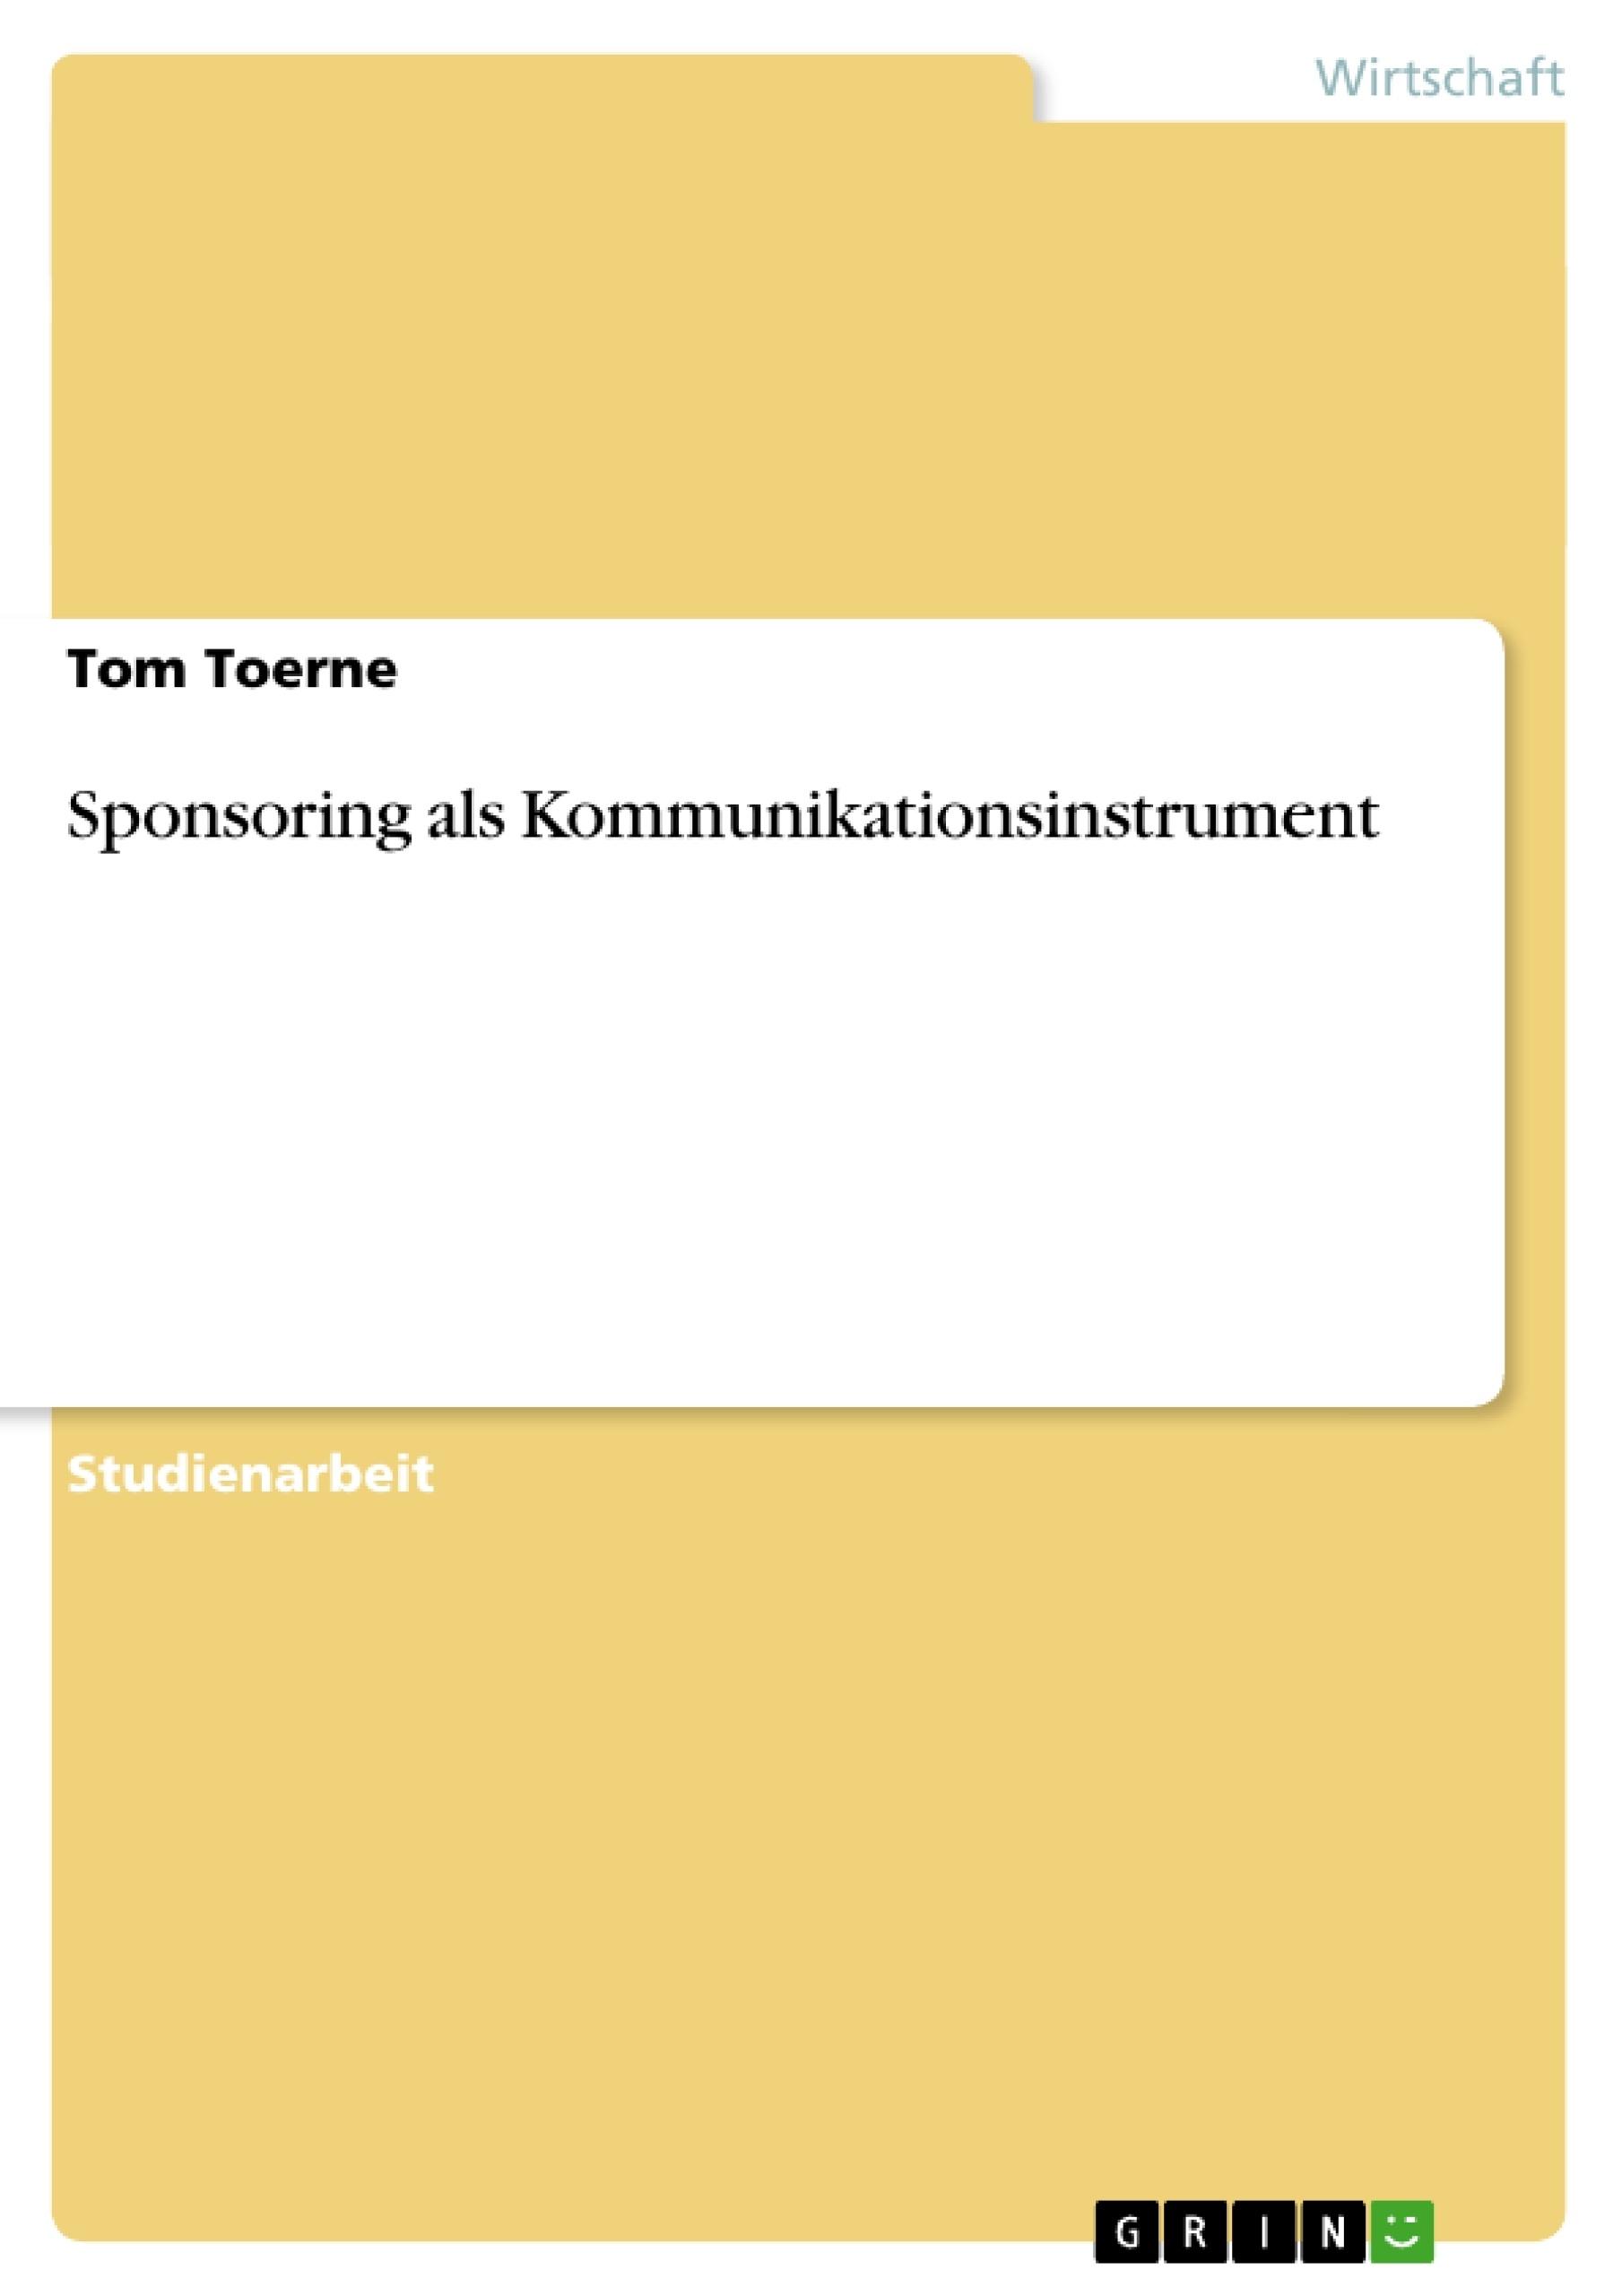 Titel: Sponsoring als Kommunikationsinstrument